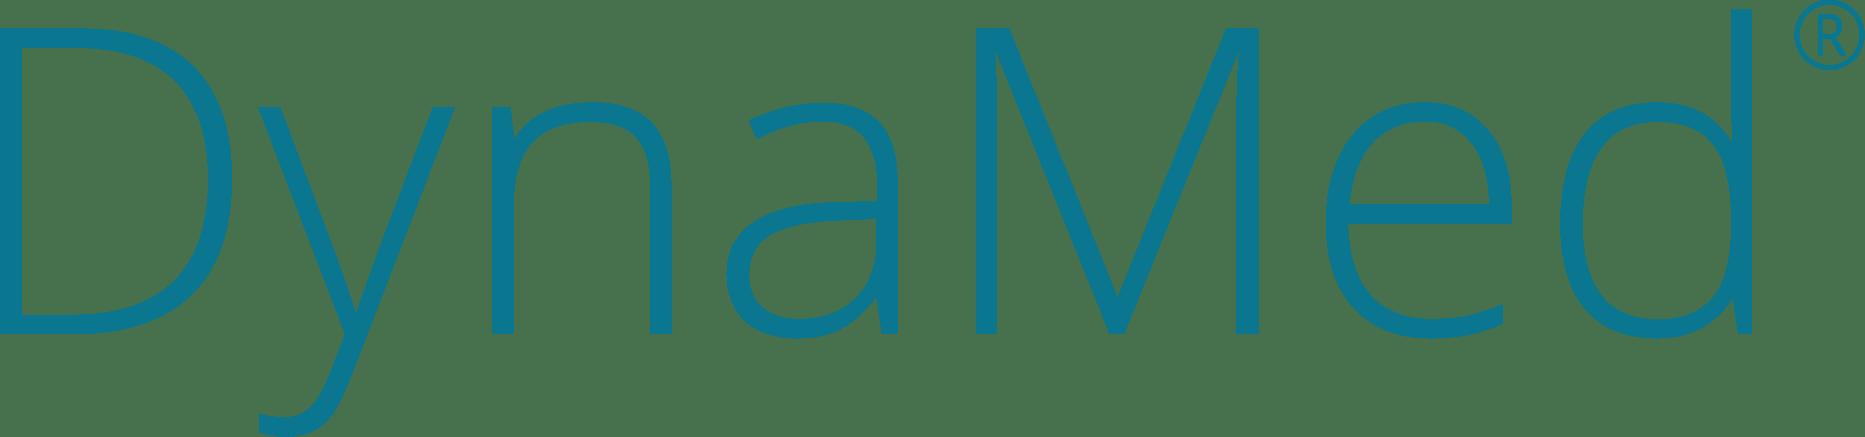 ALiEM Chief Resident Incubator 2019-20